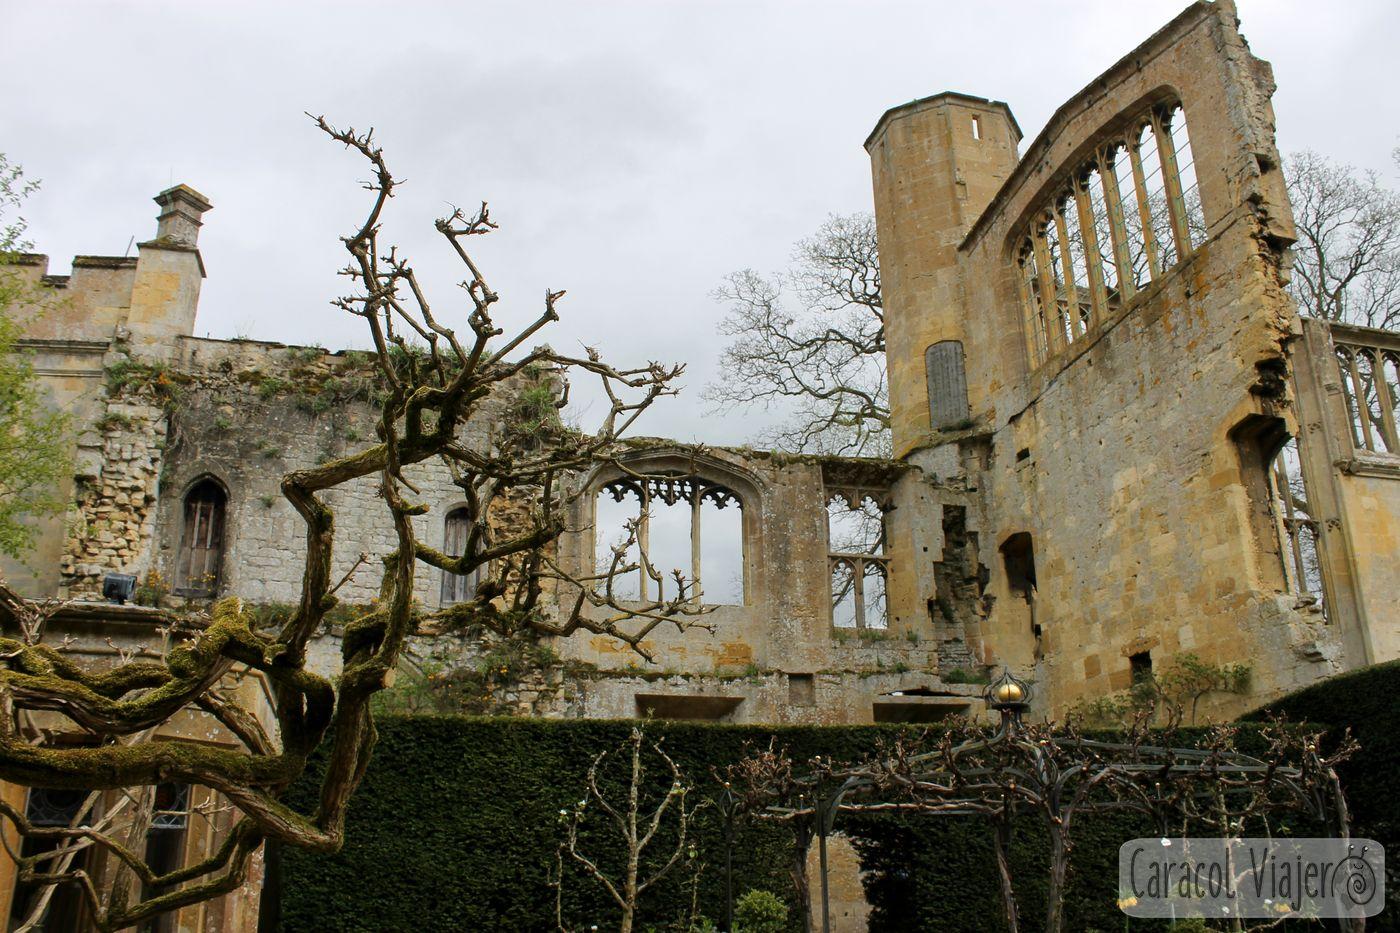 Castillo de Sudeley jardín interior, Cotswolds, Inglaterra.